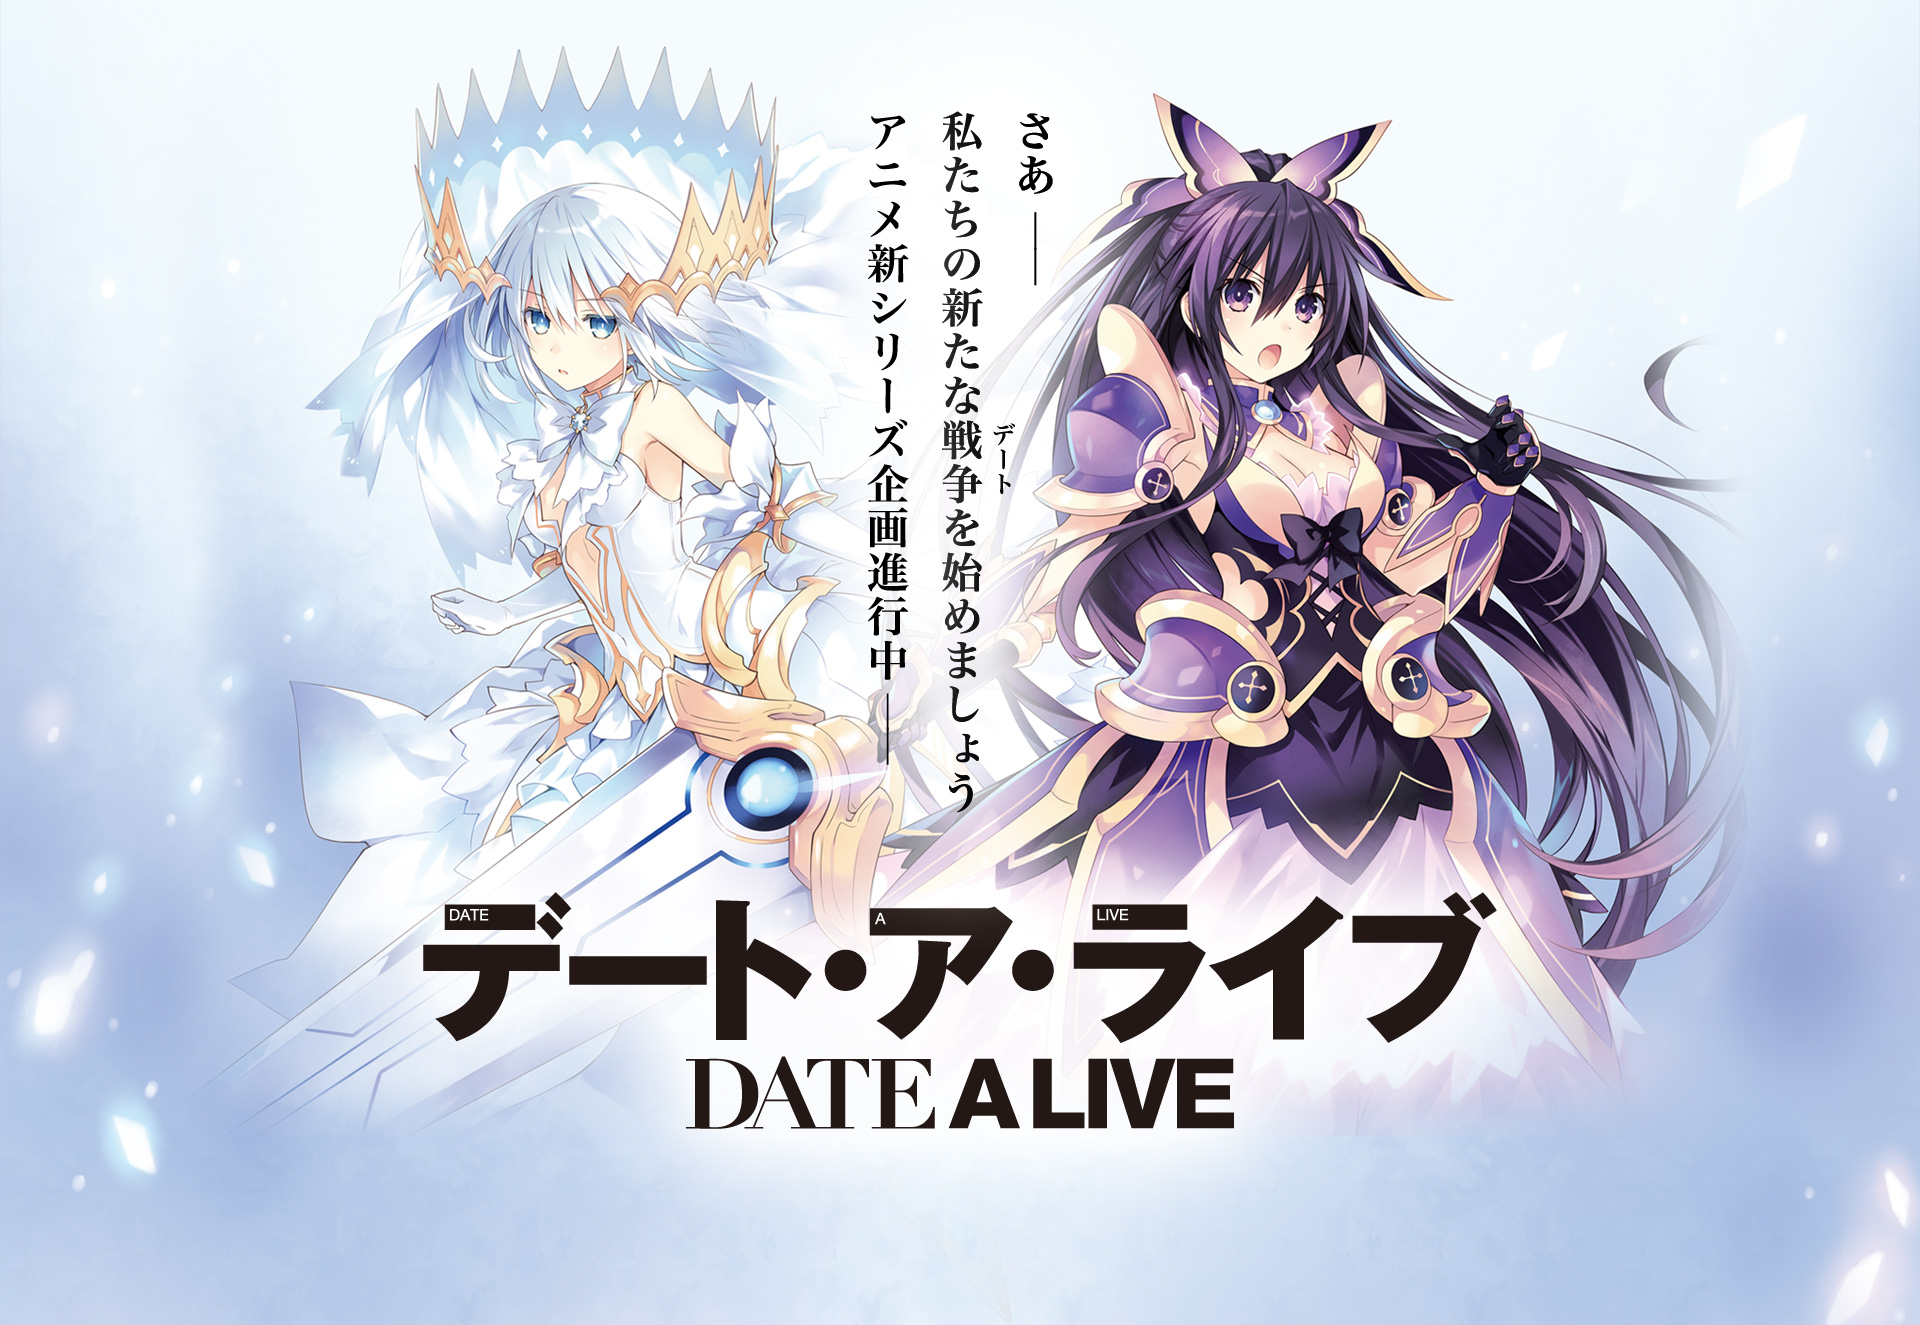 Date A Live new anime season announcement bg